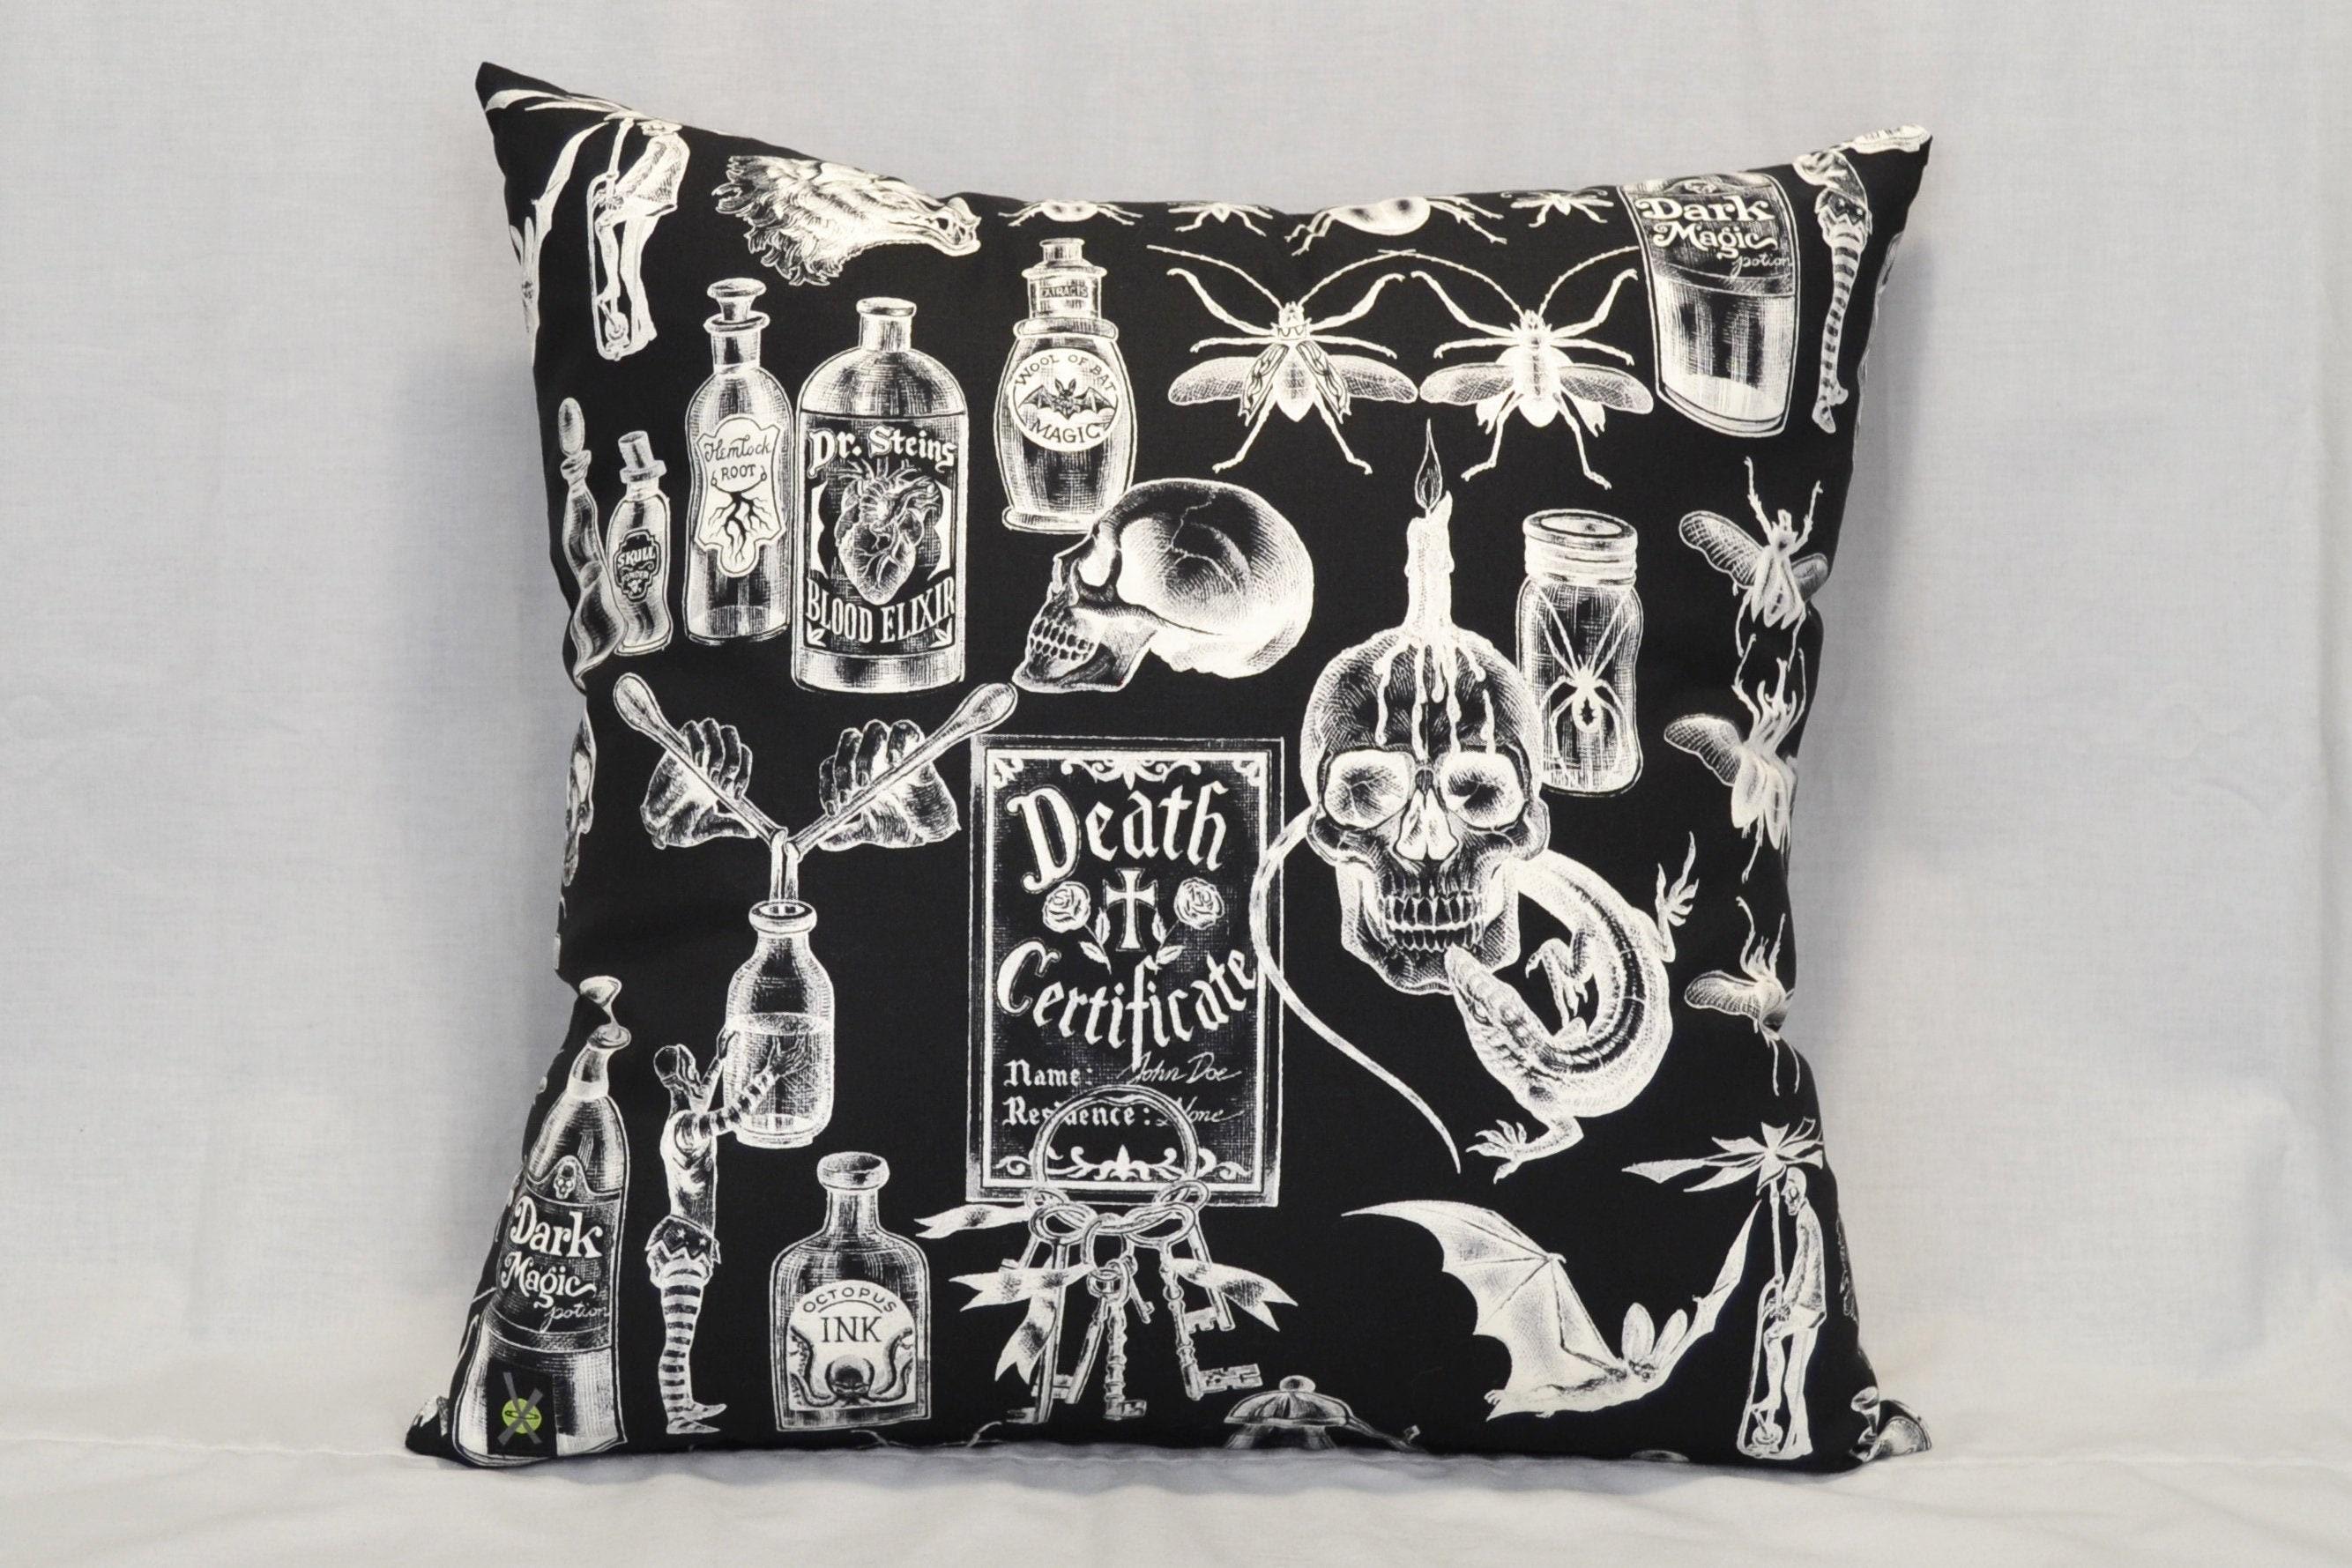 Dark Magic 18 Inch Throw Pillow Gothic Home Decor Horror Punk Voodoo Witchcraft Occult Halloween Decorative Pillow Skulls Bugs